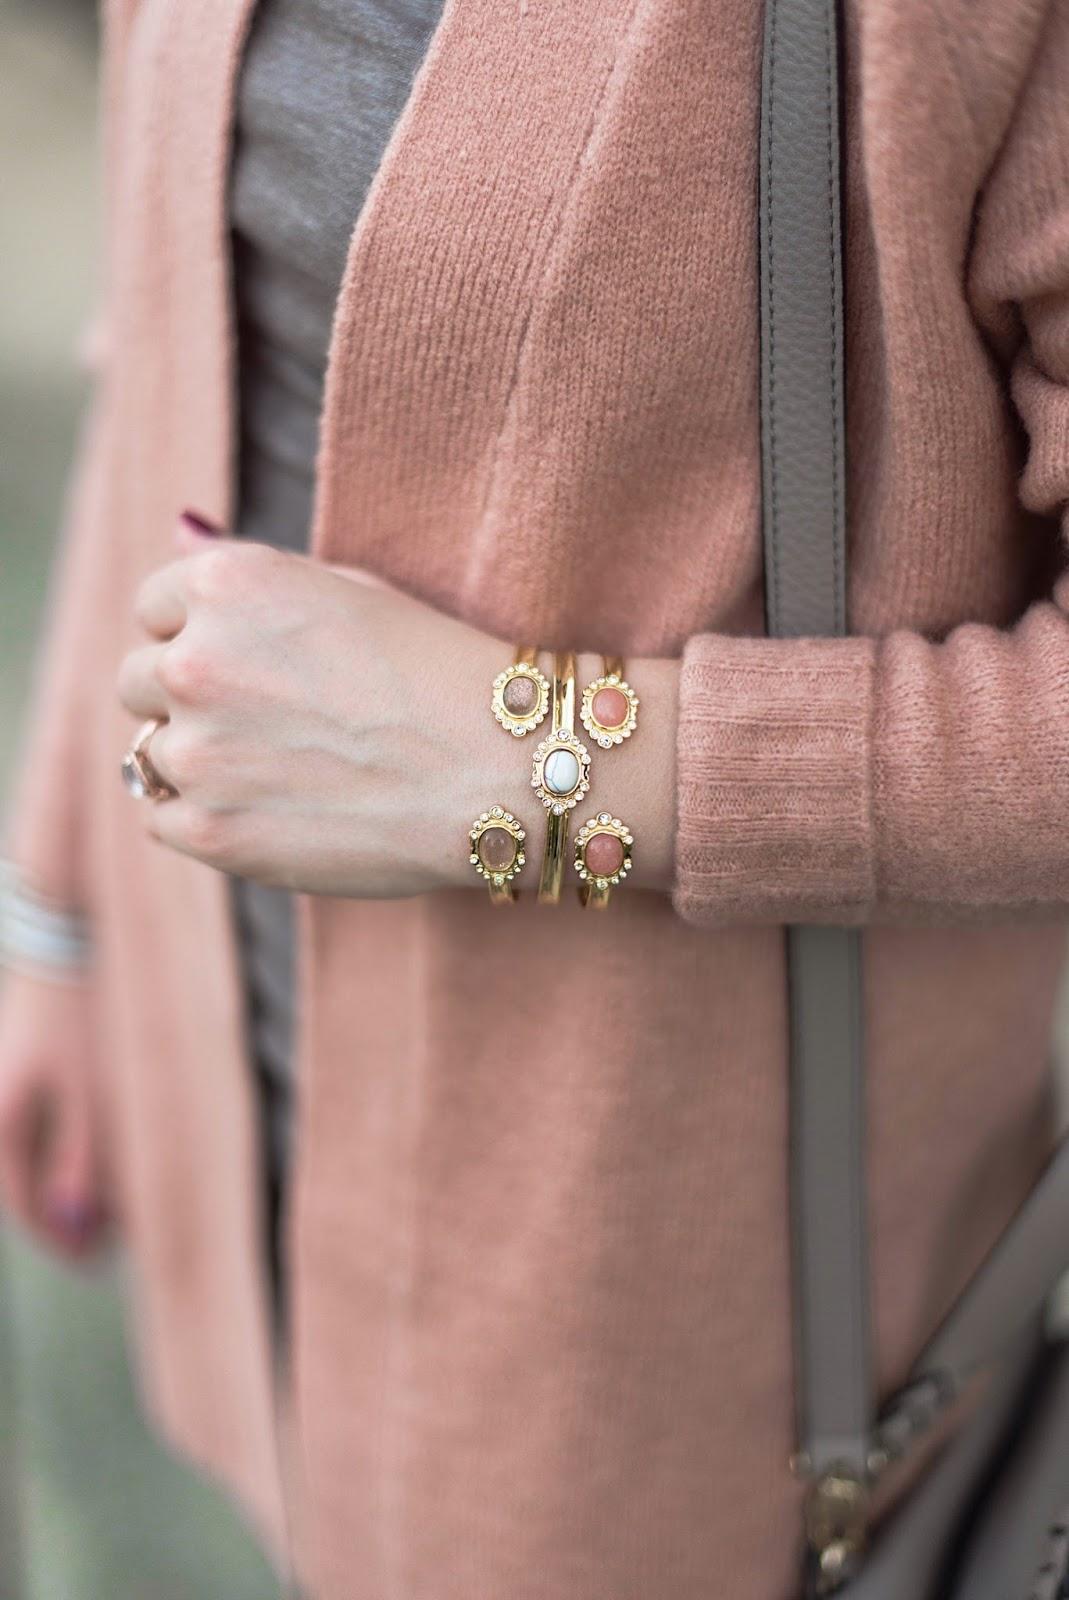 Frazier Lynn Bracelets - Something Delightful Blog